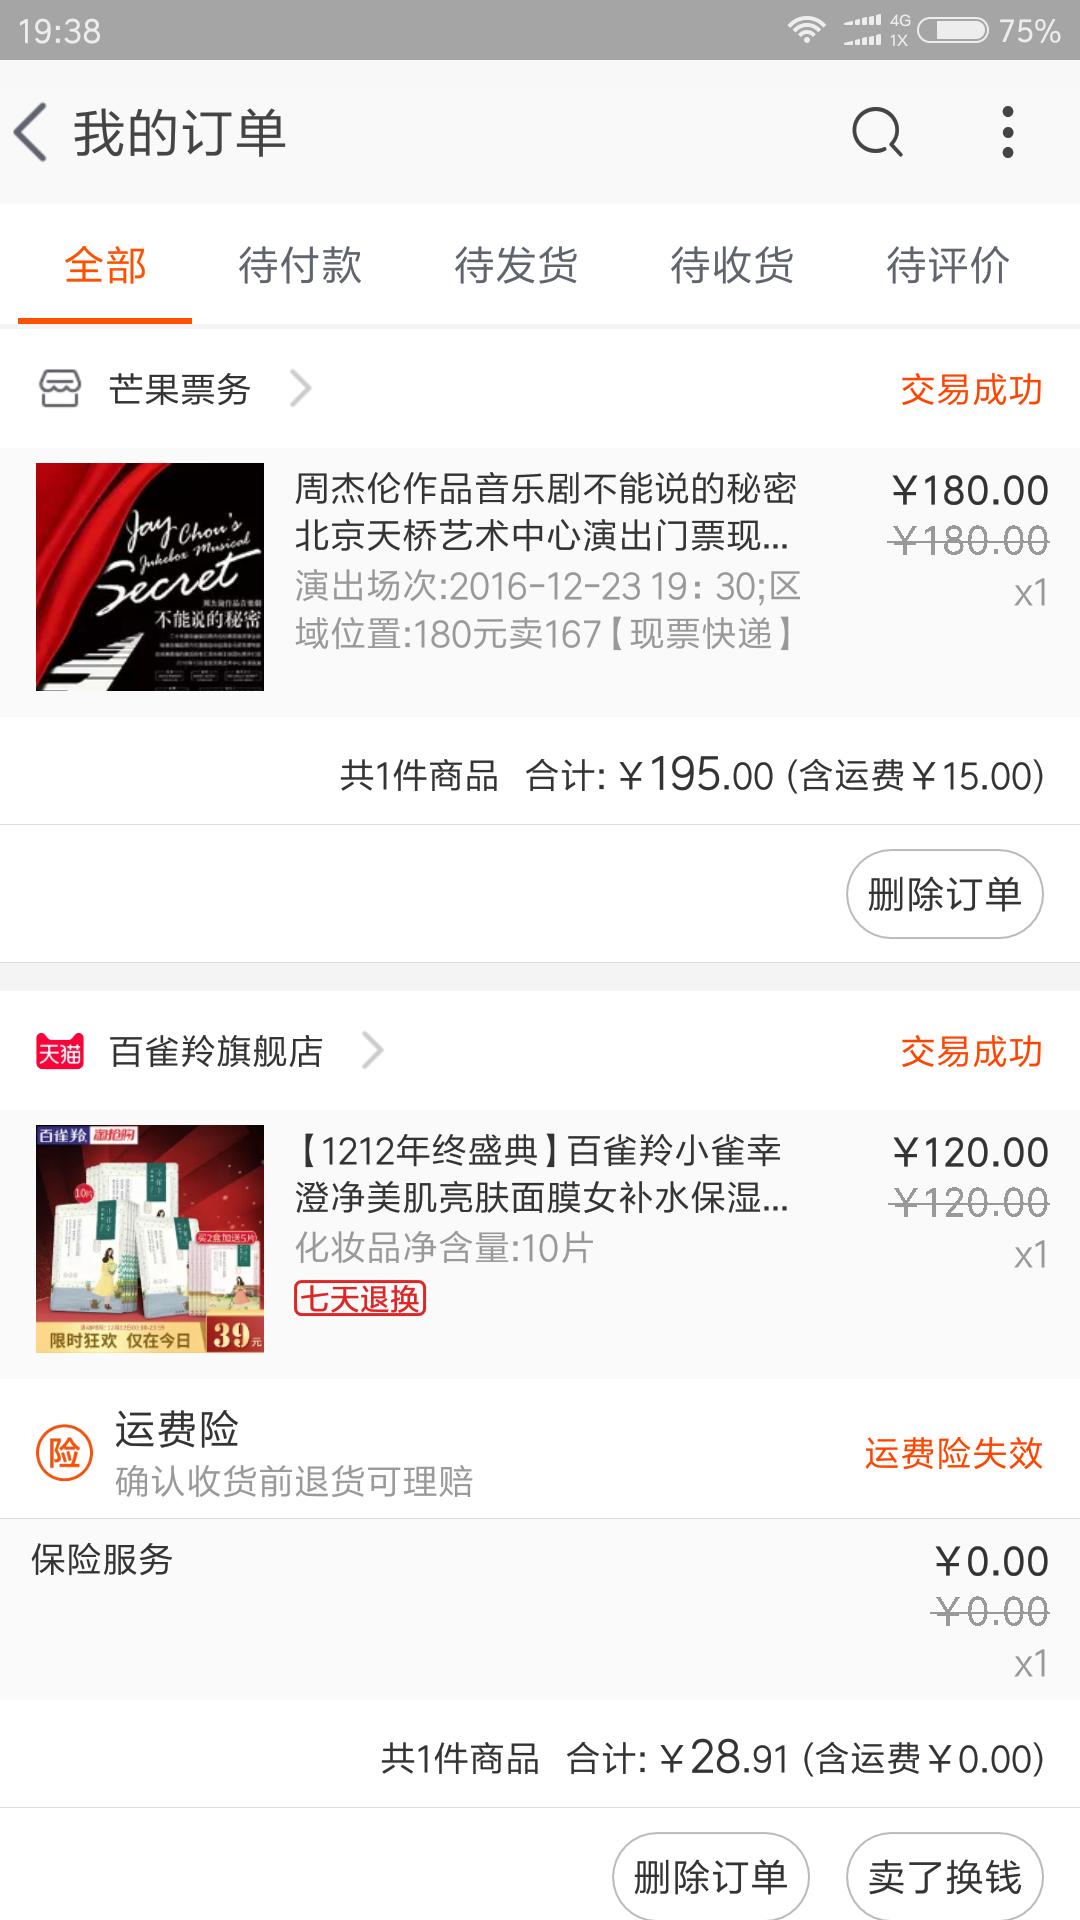 Screenshot_2017-08-22-19-38-39-773_com.taobao.taobao.png